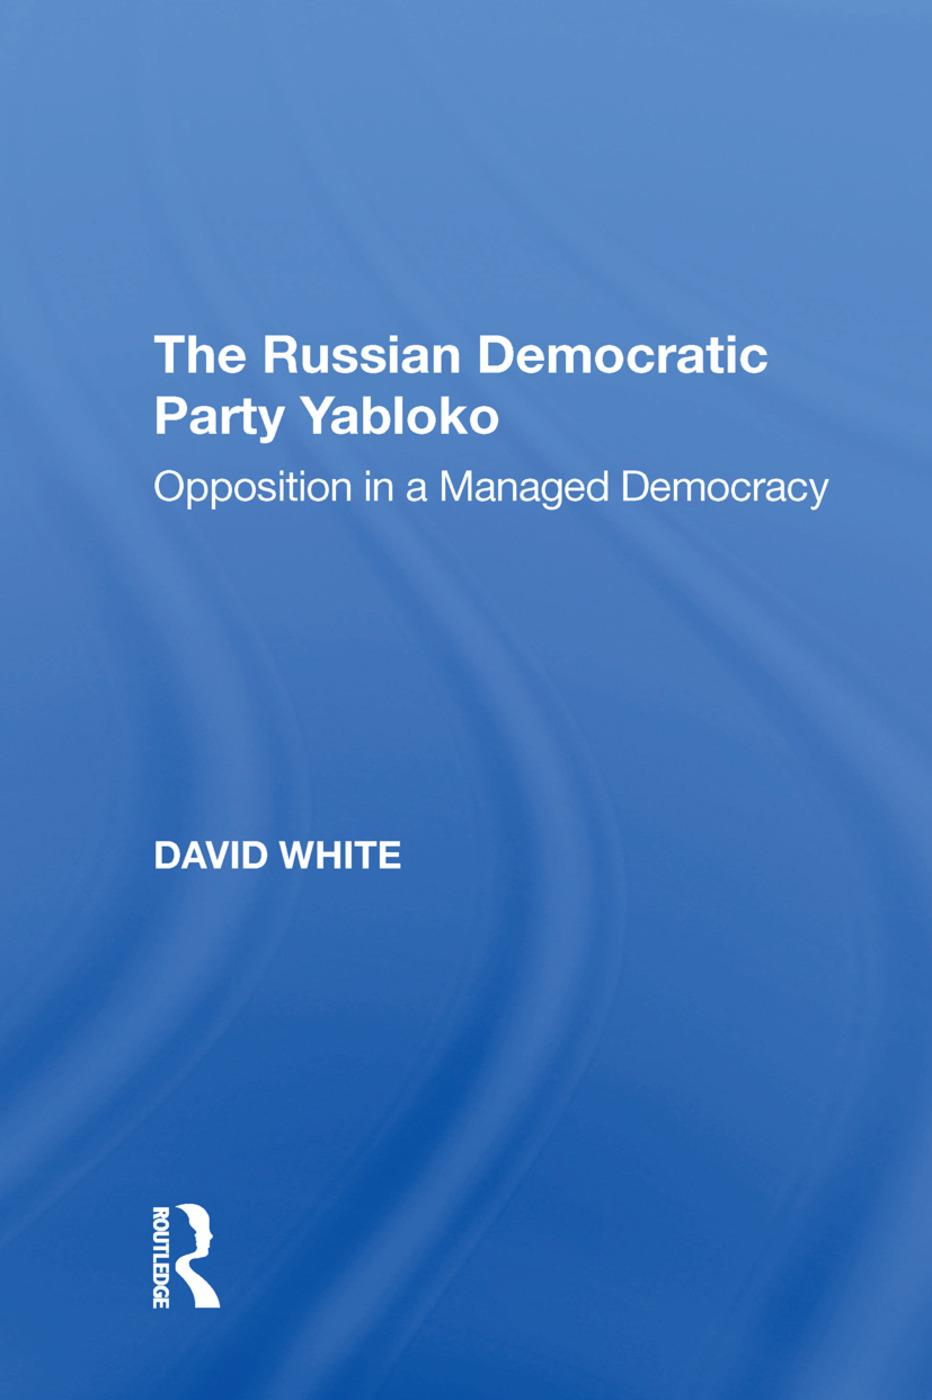 The Russian Democratic Party Yabloko